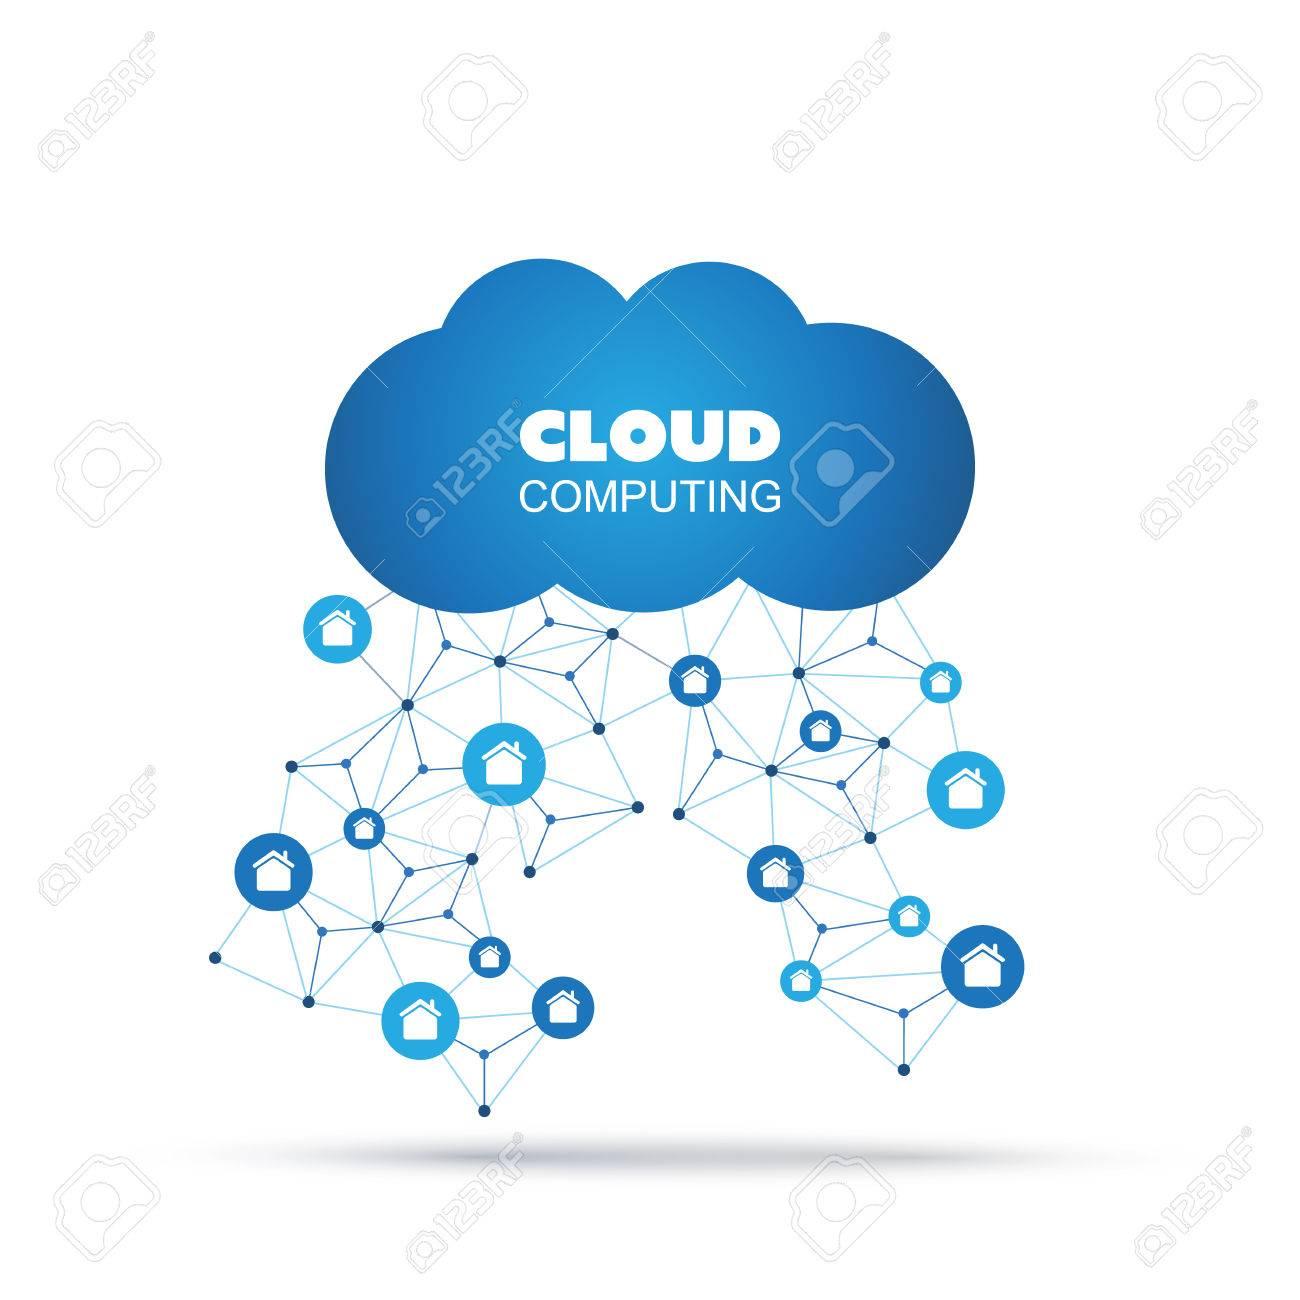 Cloud Computing, Internet Der Dinge, IIoT, Networking, Zukünftige ...